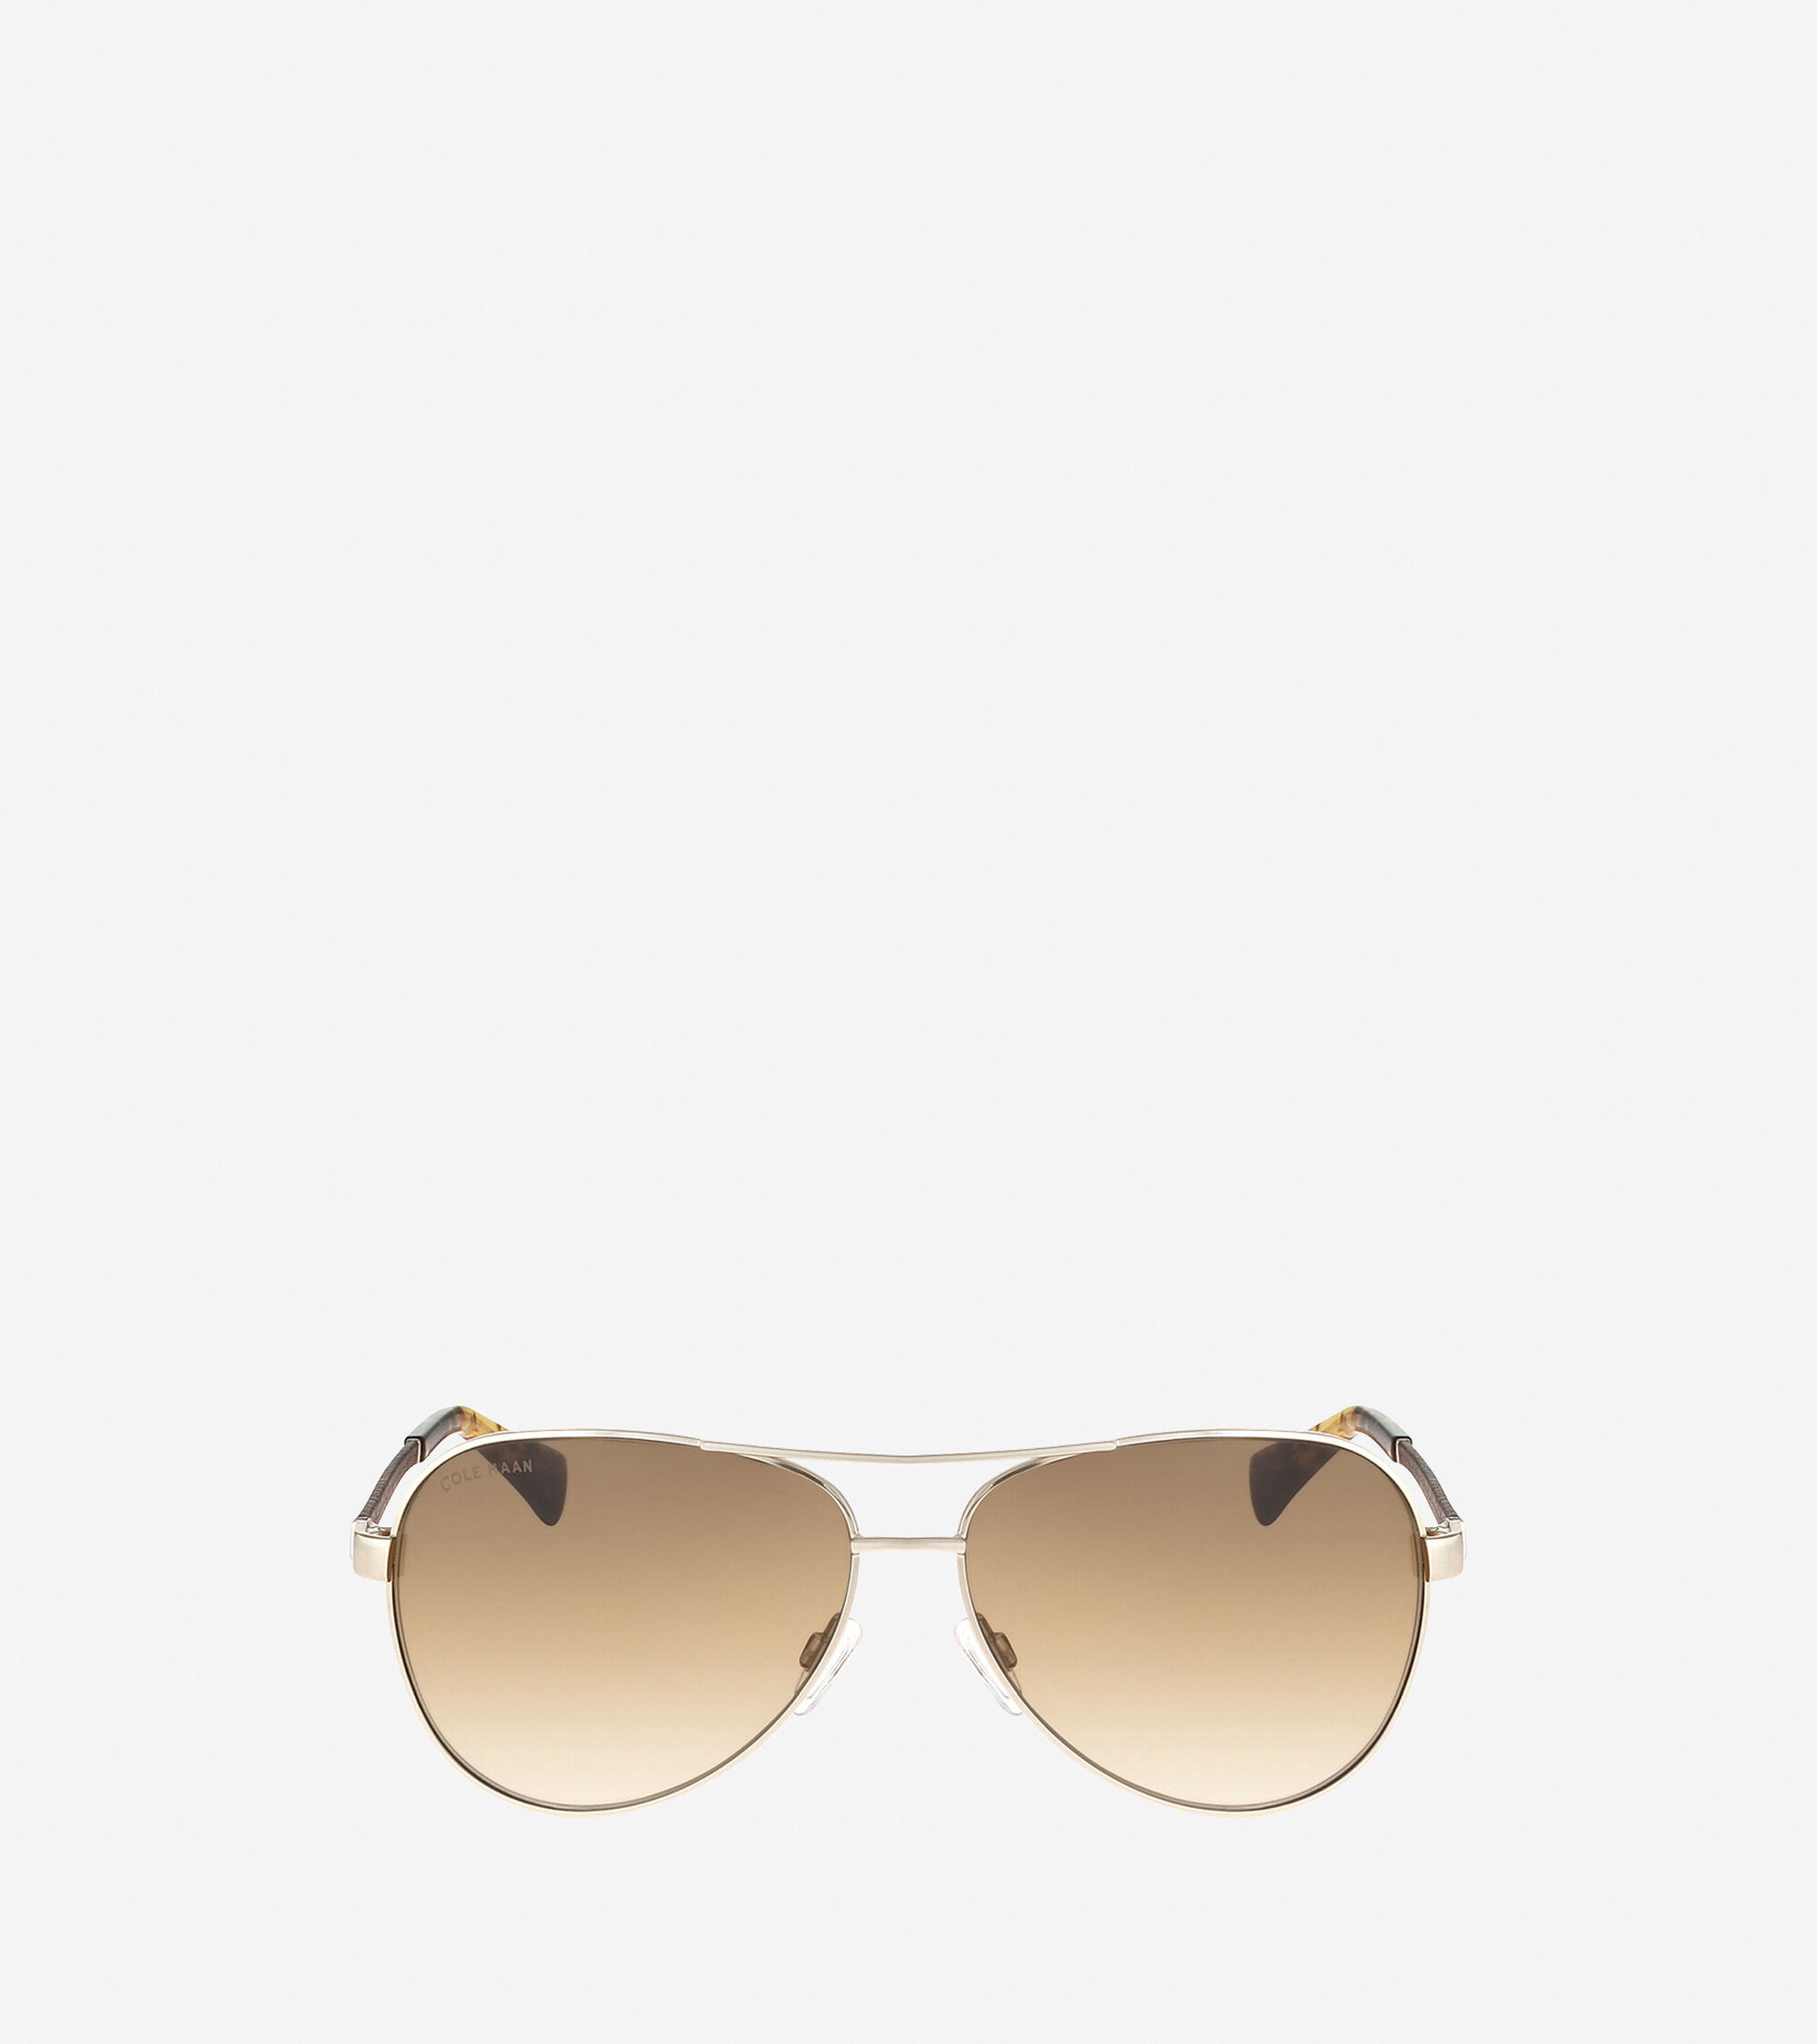 Sunglasses > Metal Aviator Sunglasses With Leather